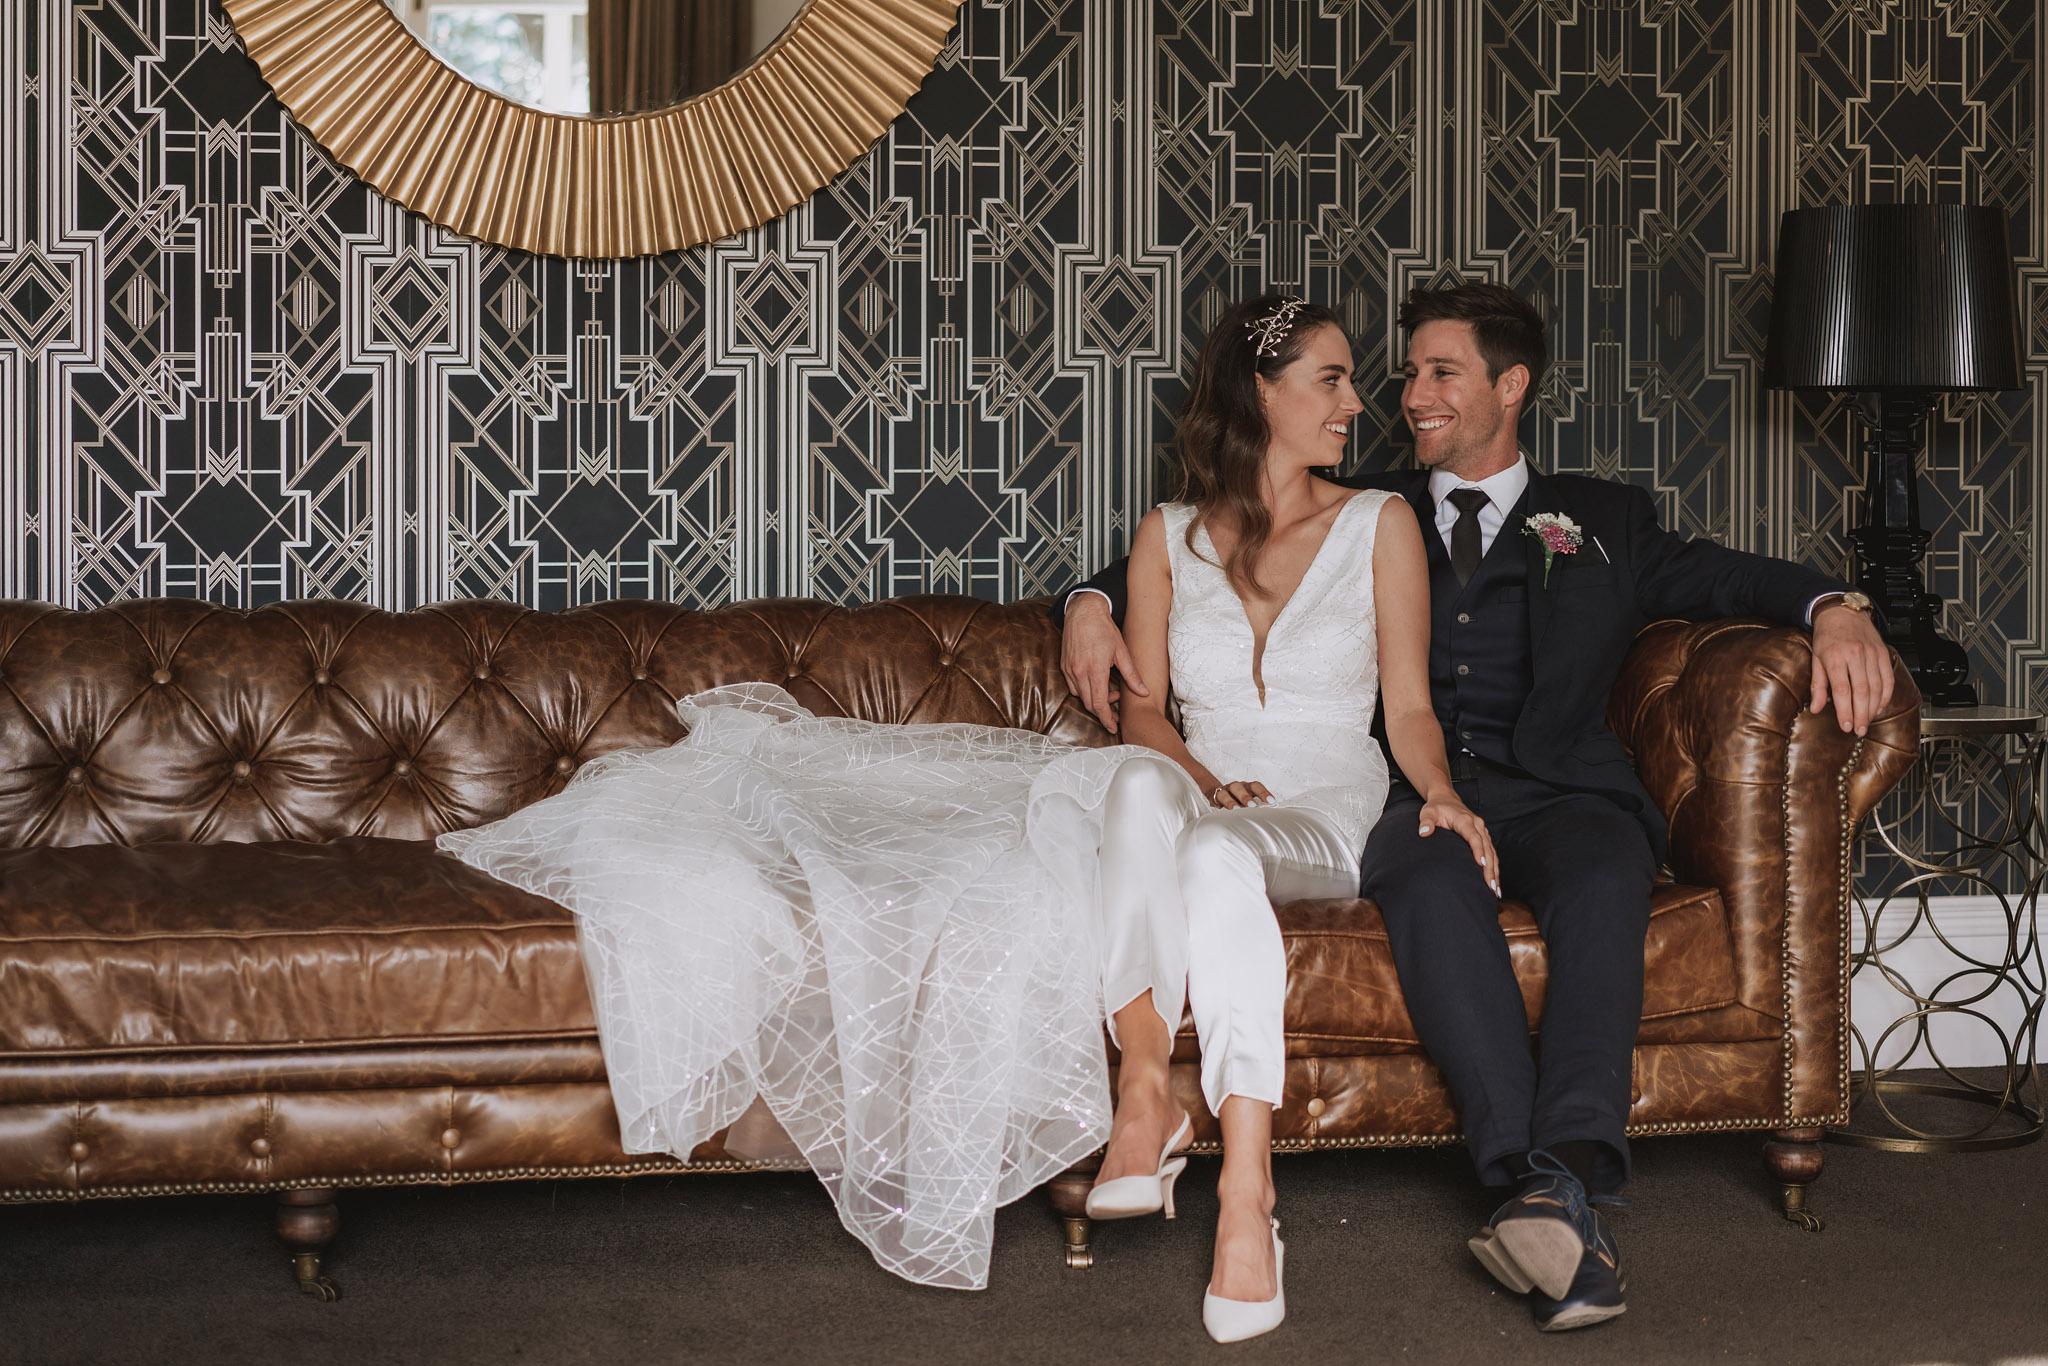 rambo-estrada-rubymatt-kauri-bay-boomrock-auckland-wedding-photographers-0427-c copy.jpg